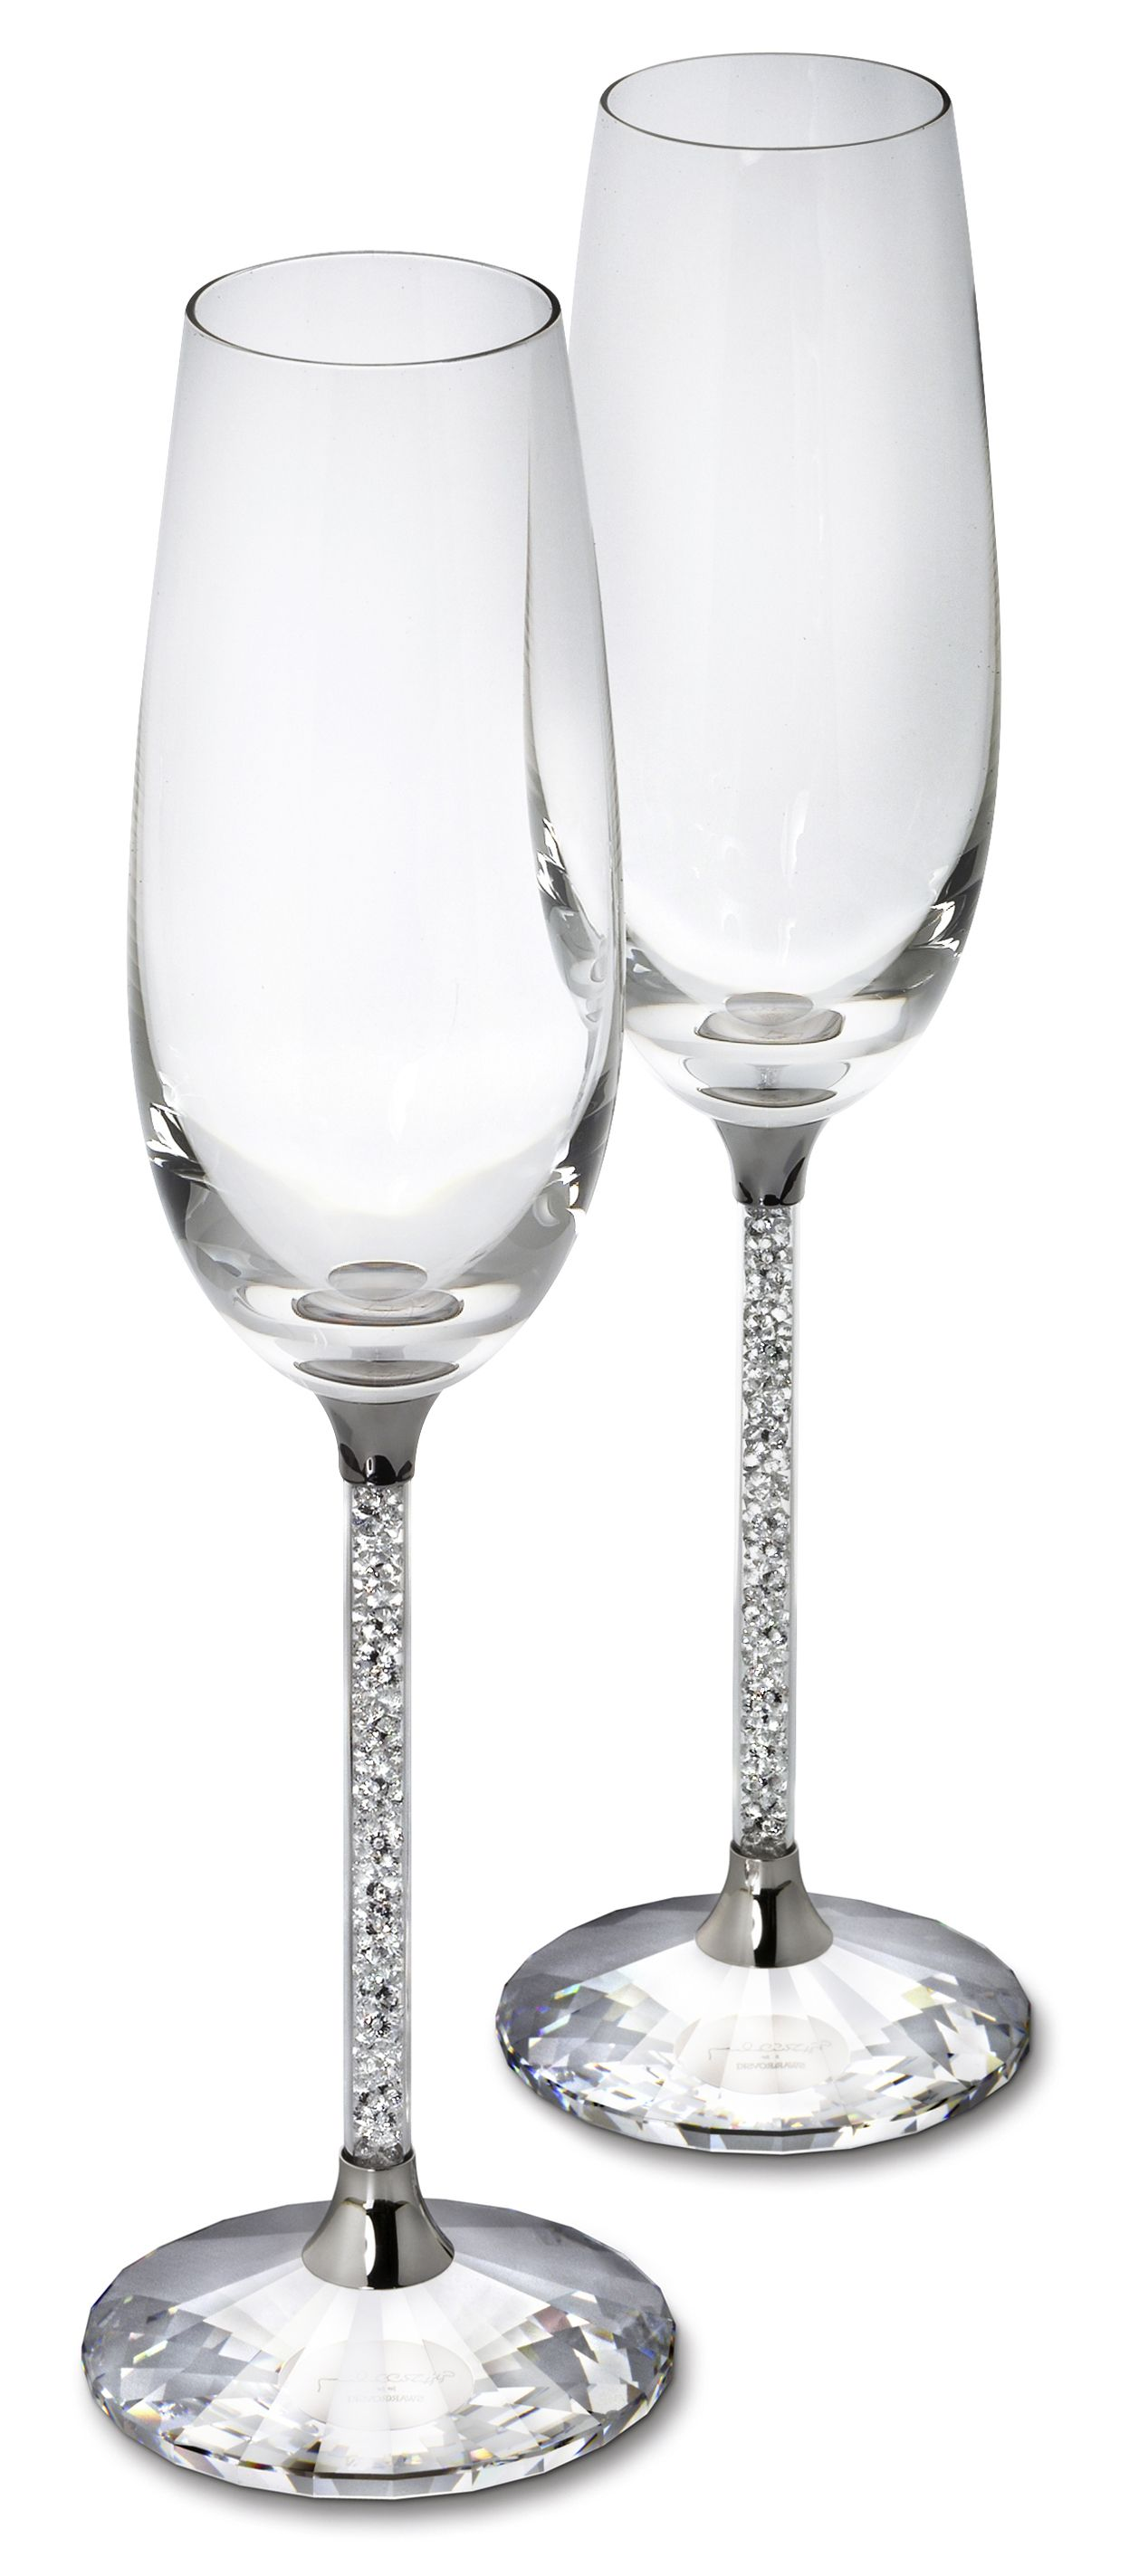 @Swarovski Holiday Party Style: Crystalline Toasting Flutes #Moments2Give